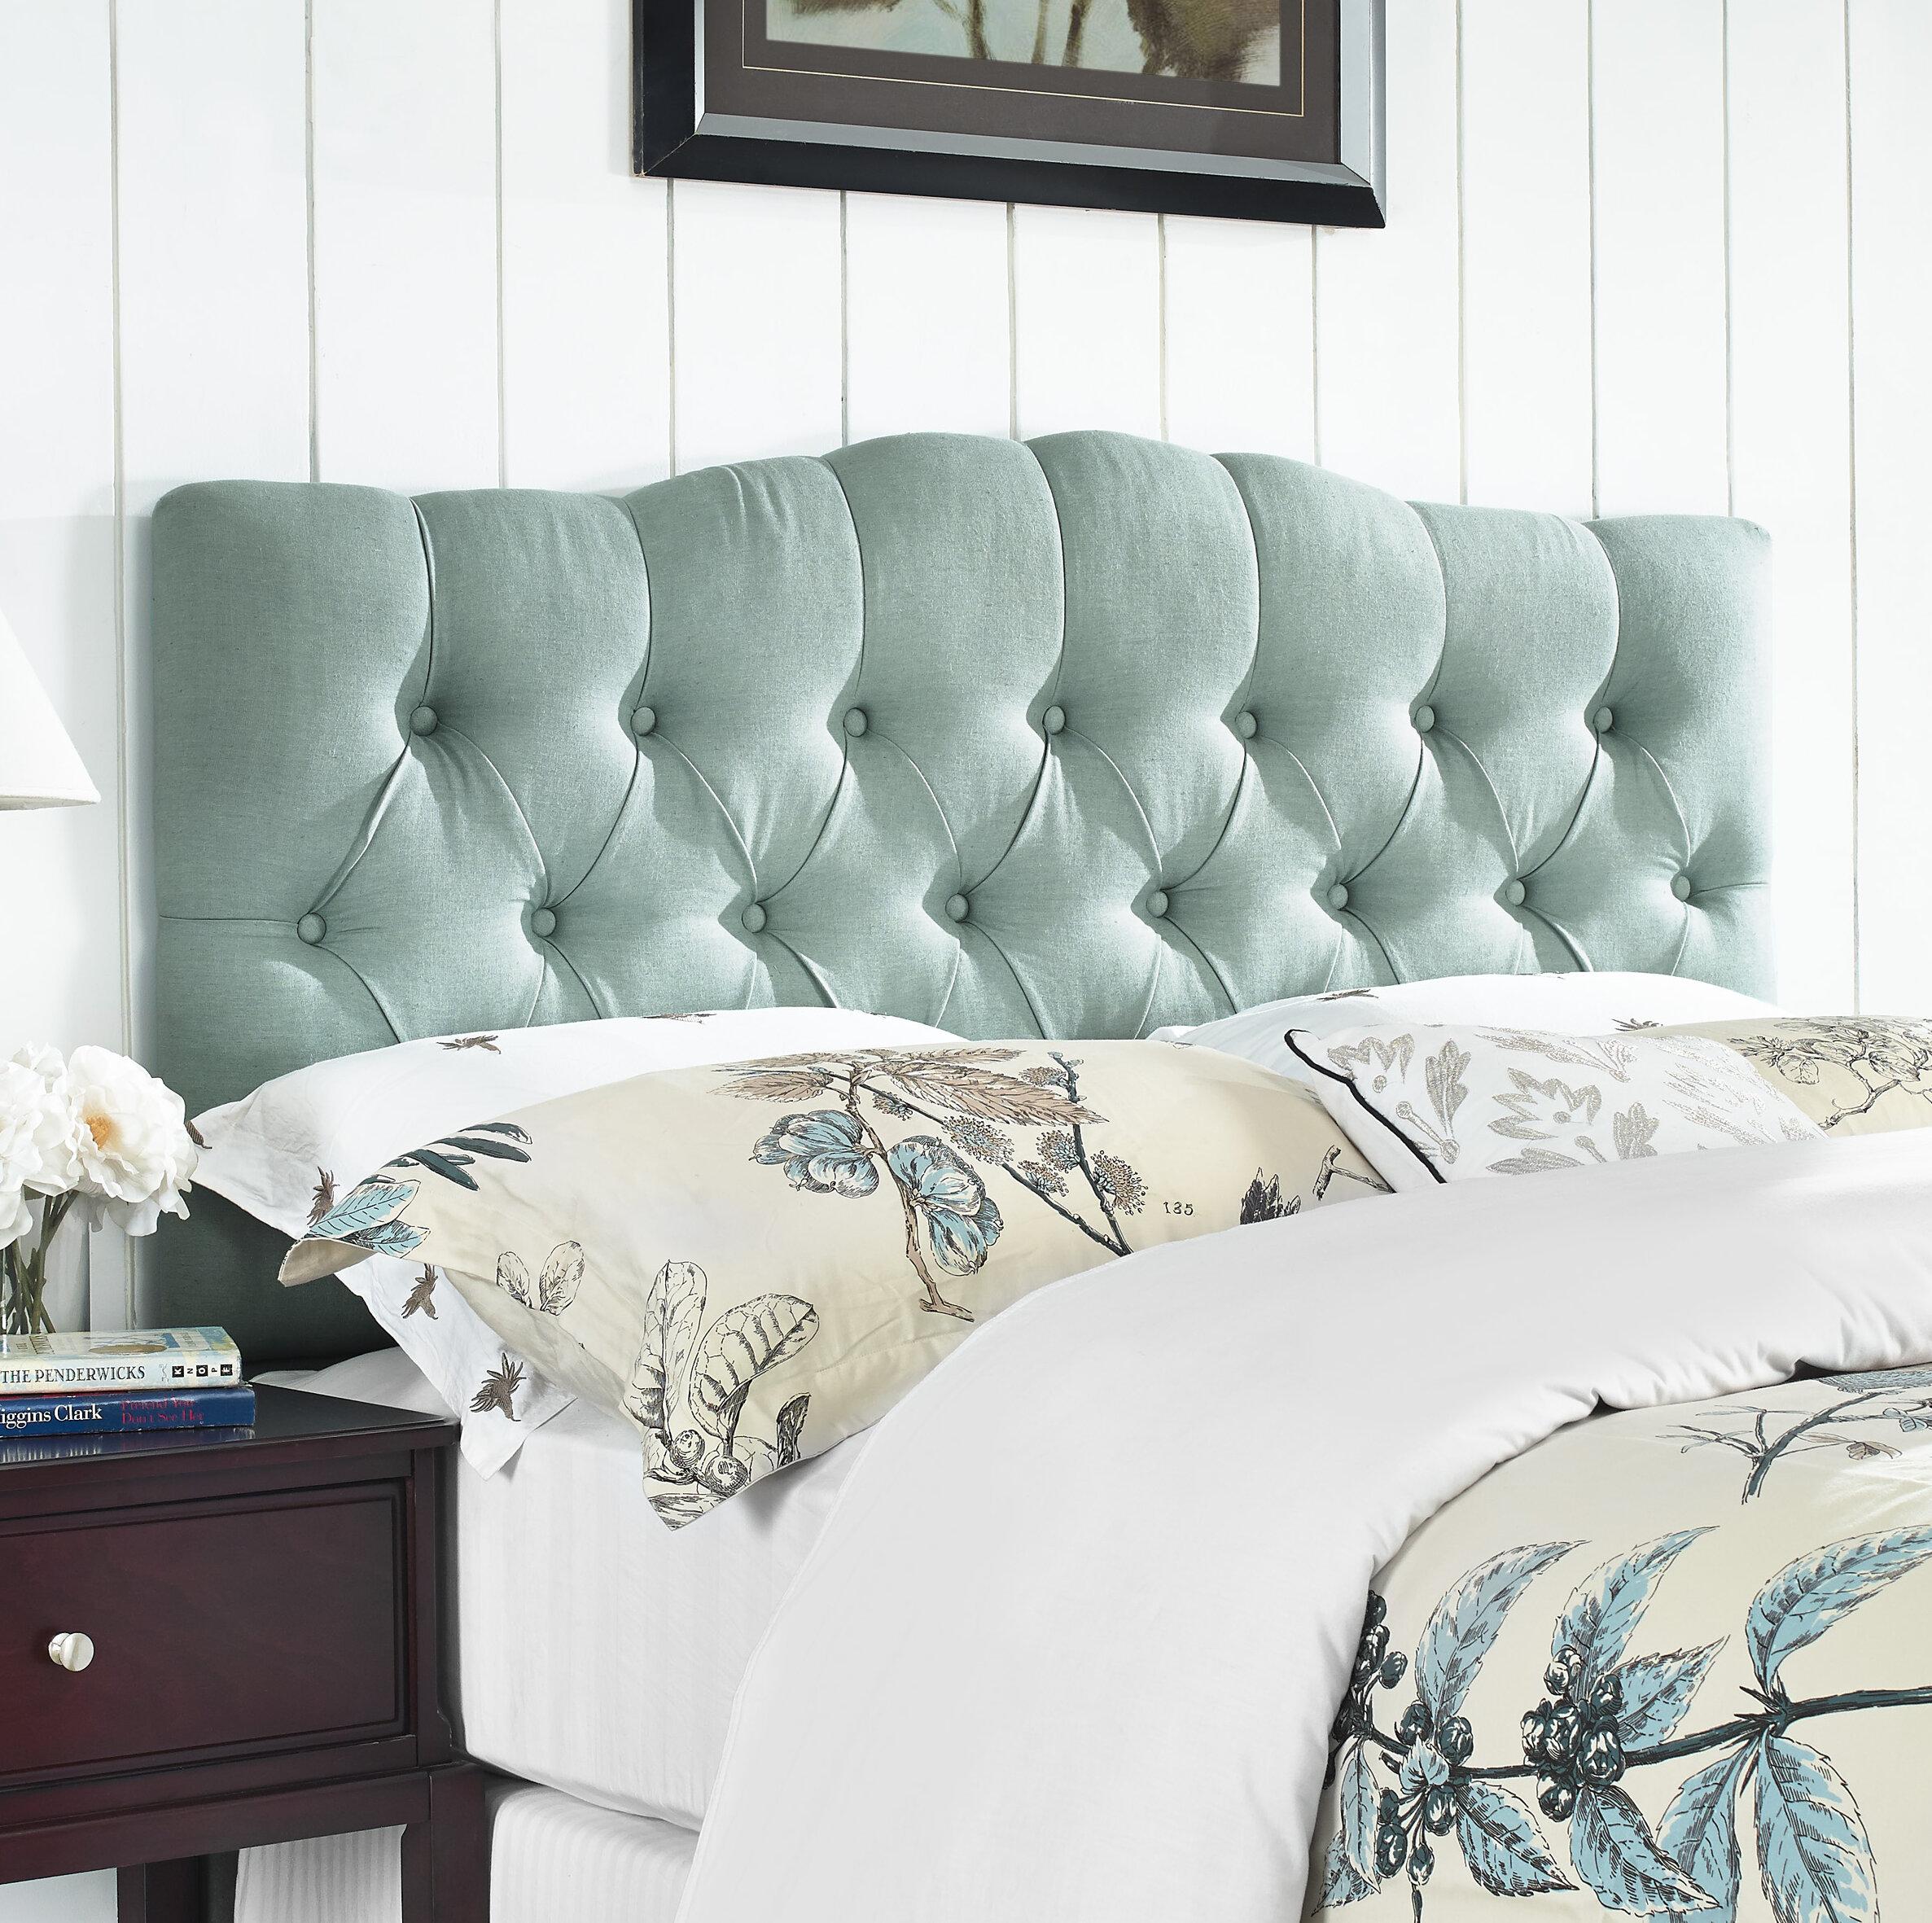 joss tufted furniture main headboard reviews pdp katia comforter